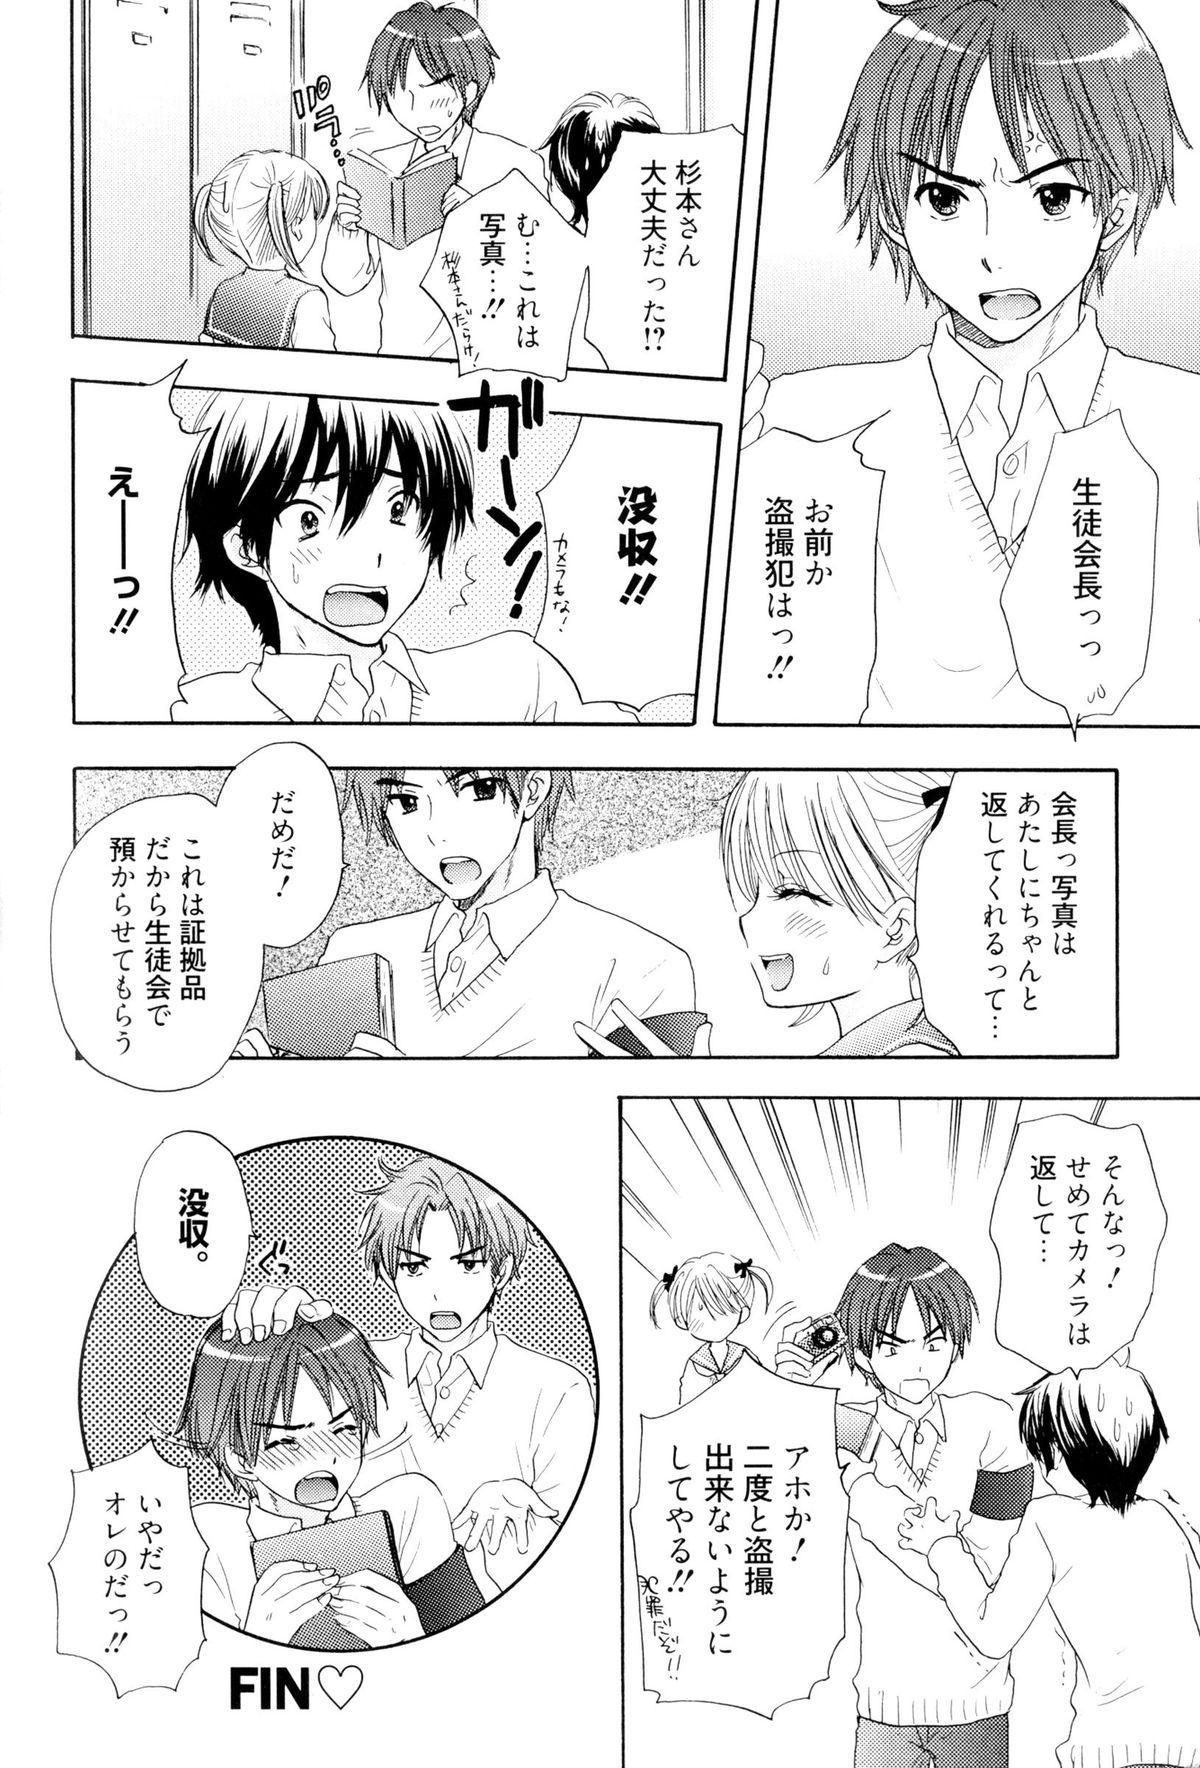 The Great Escape 4 Shokai Genteiban 199